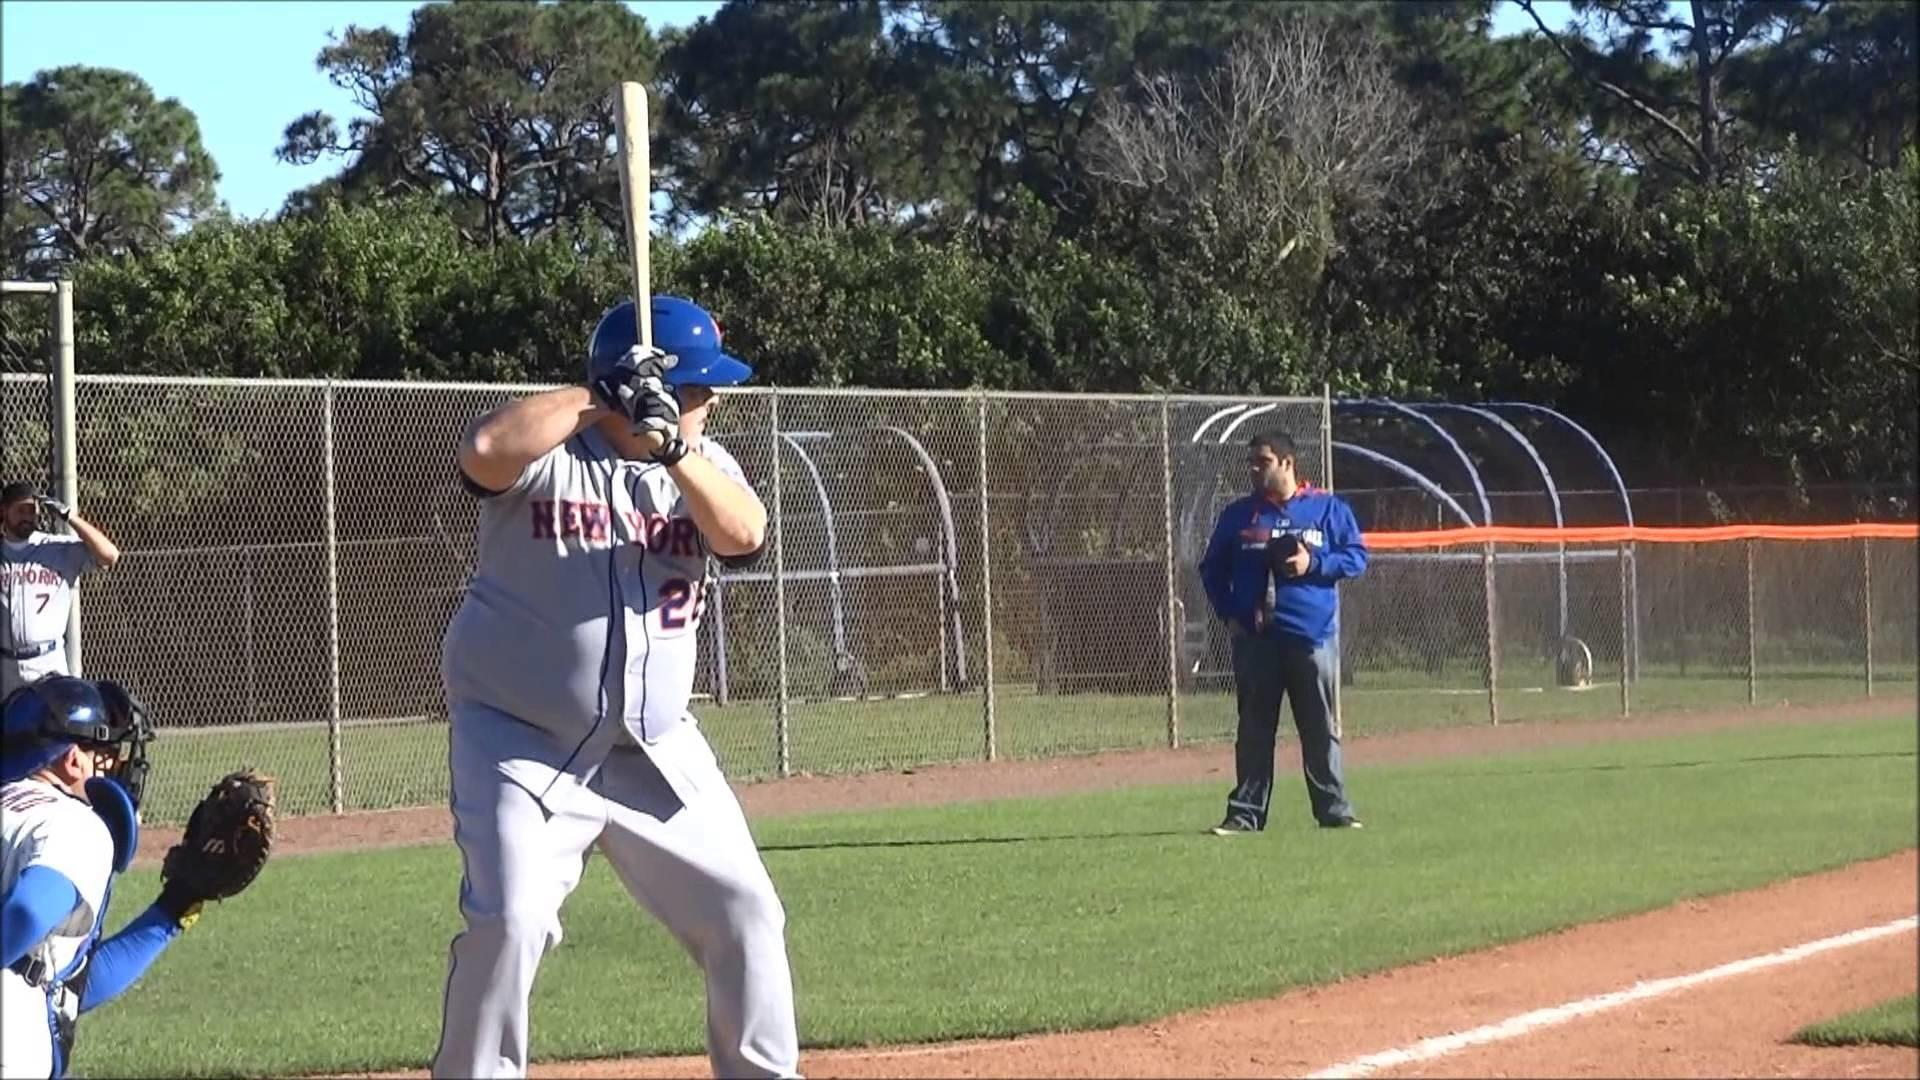 Mets Fantasy Camp 2014